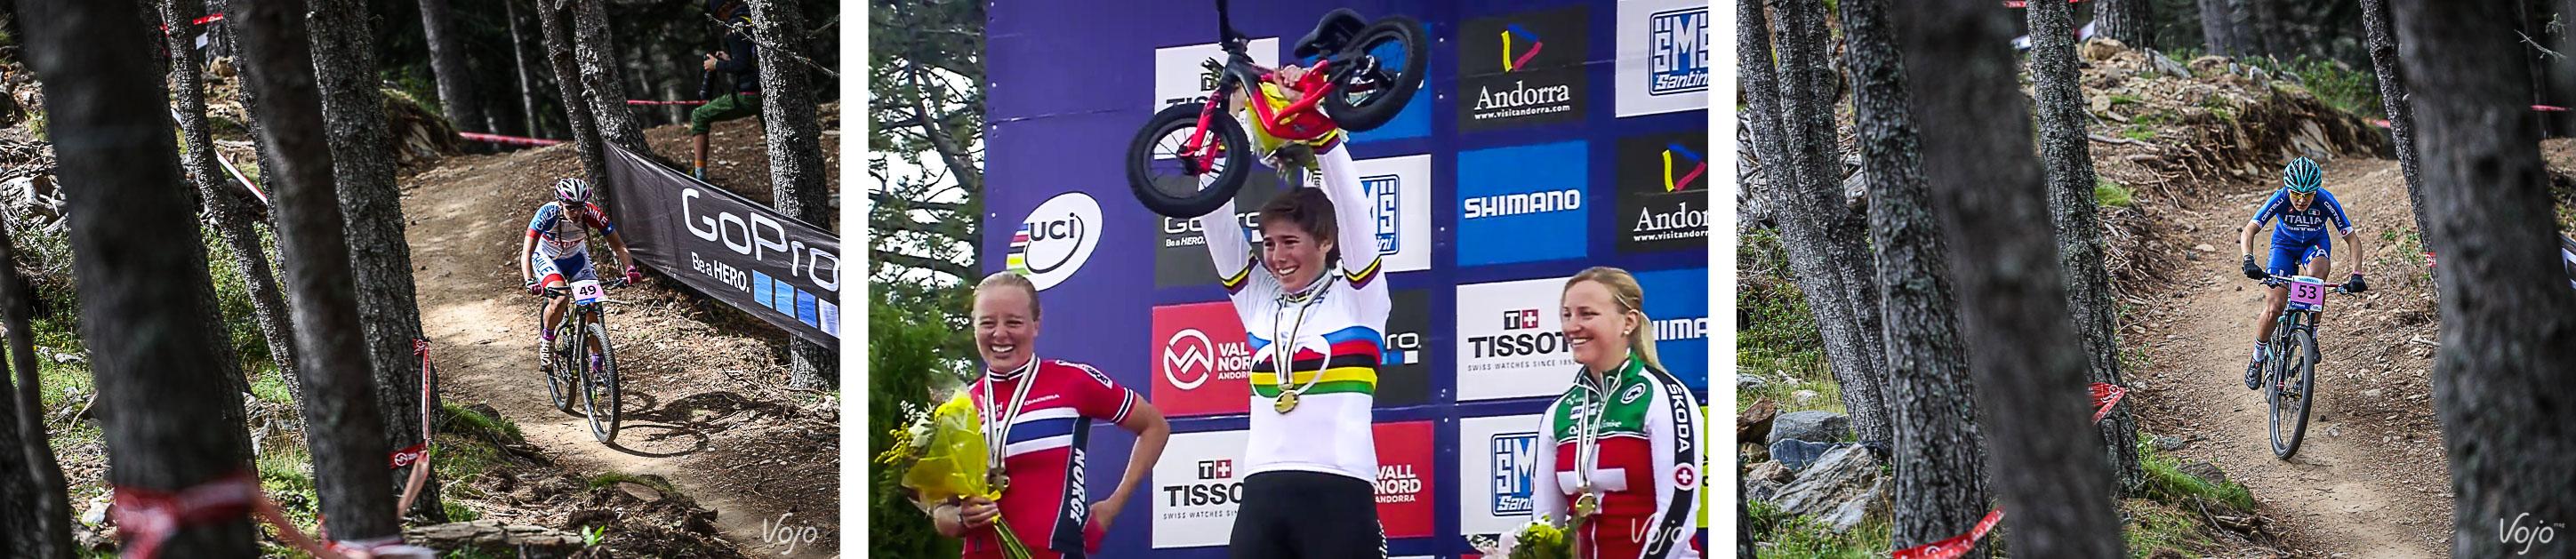 1-World_Championship_Andorra_Vallnord_XC_Eliminator_2015_Copyright_Romain_Laurent_VojoMag-1